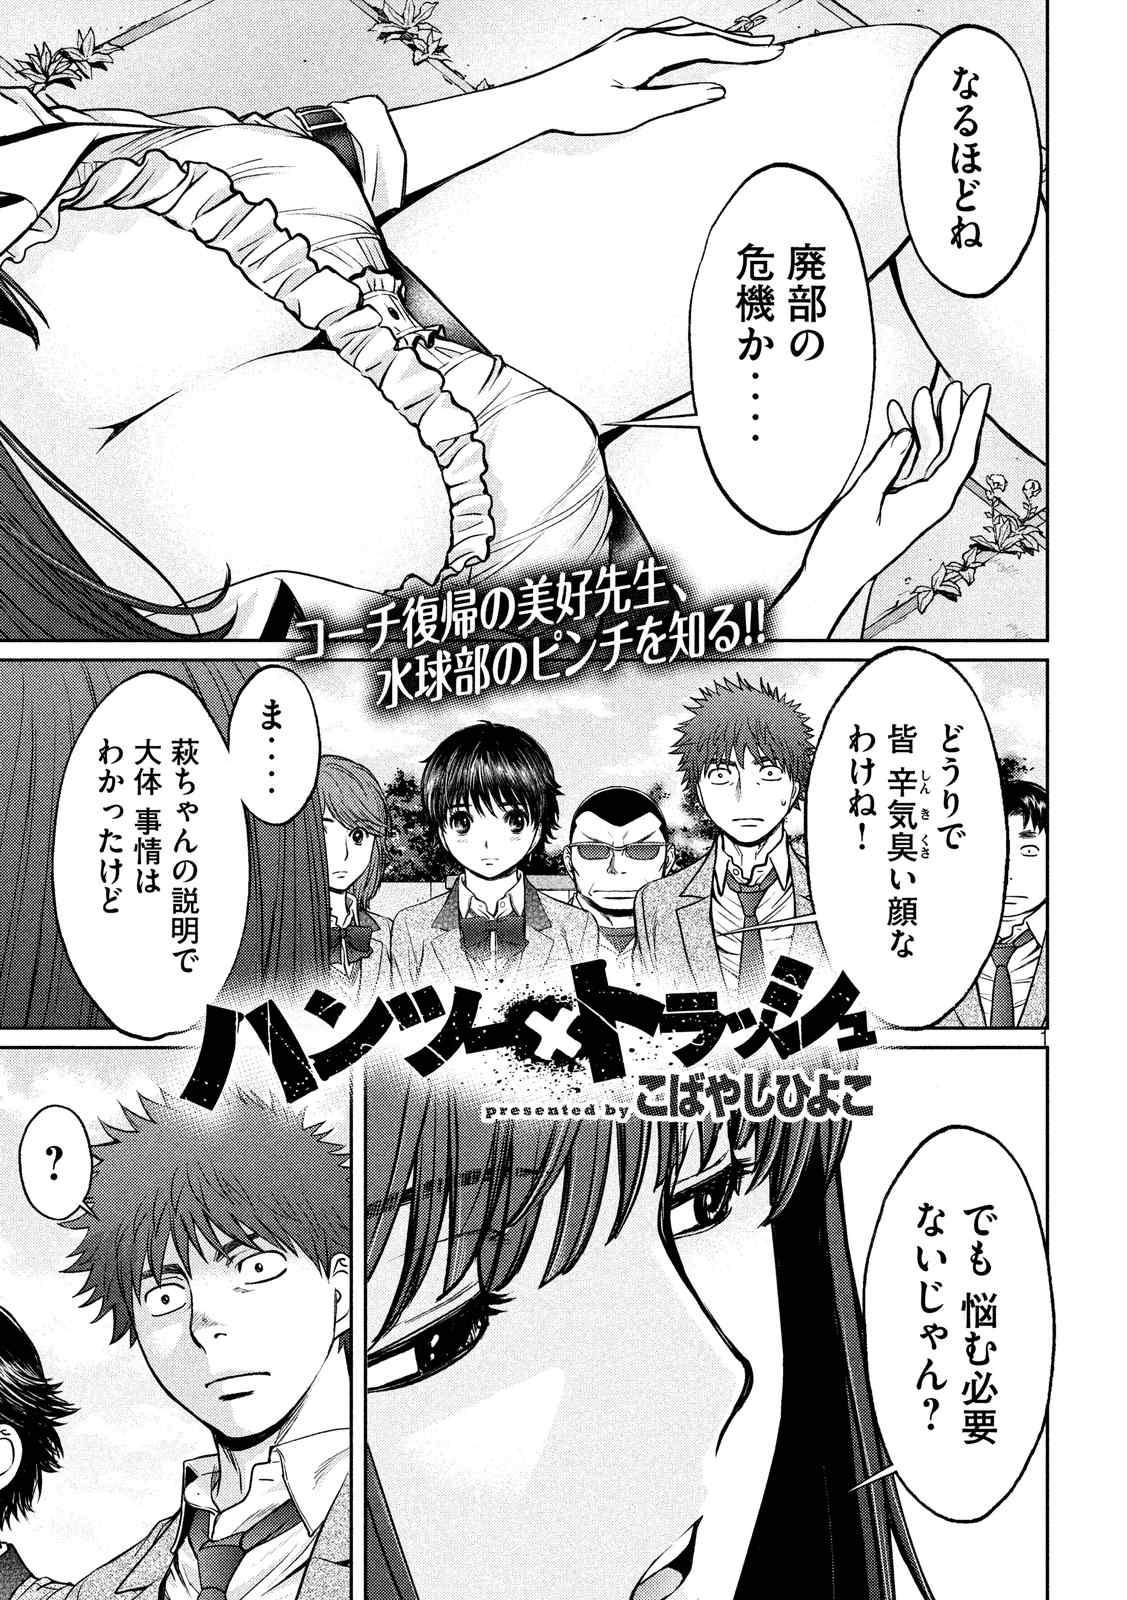 Hantsu x Trash - Chapter 94 - Page 1